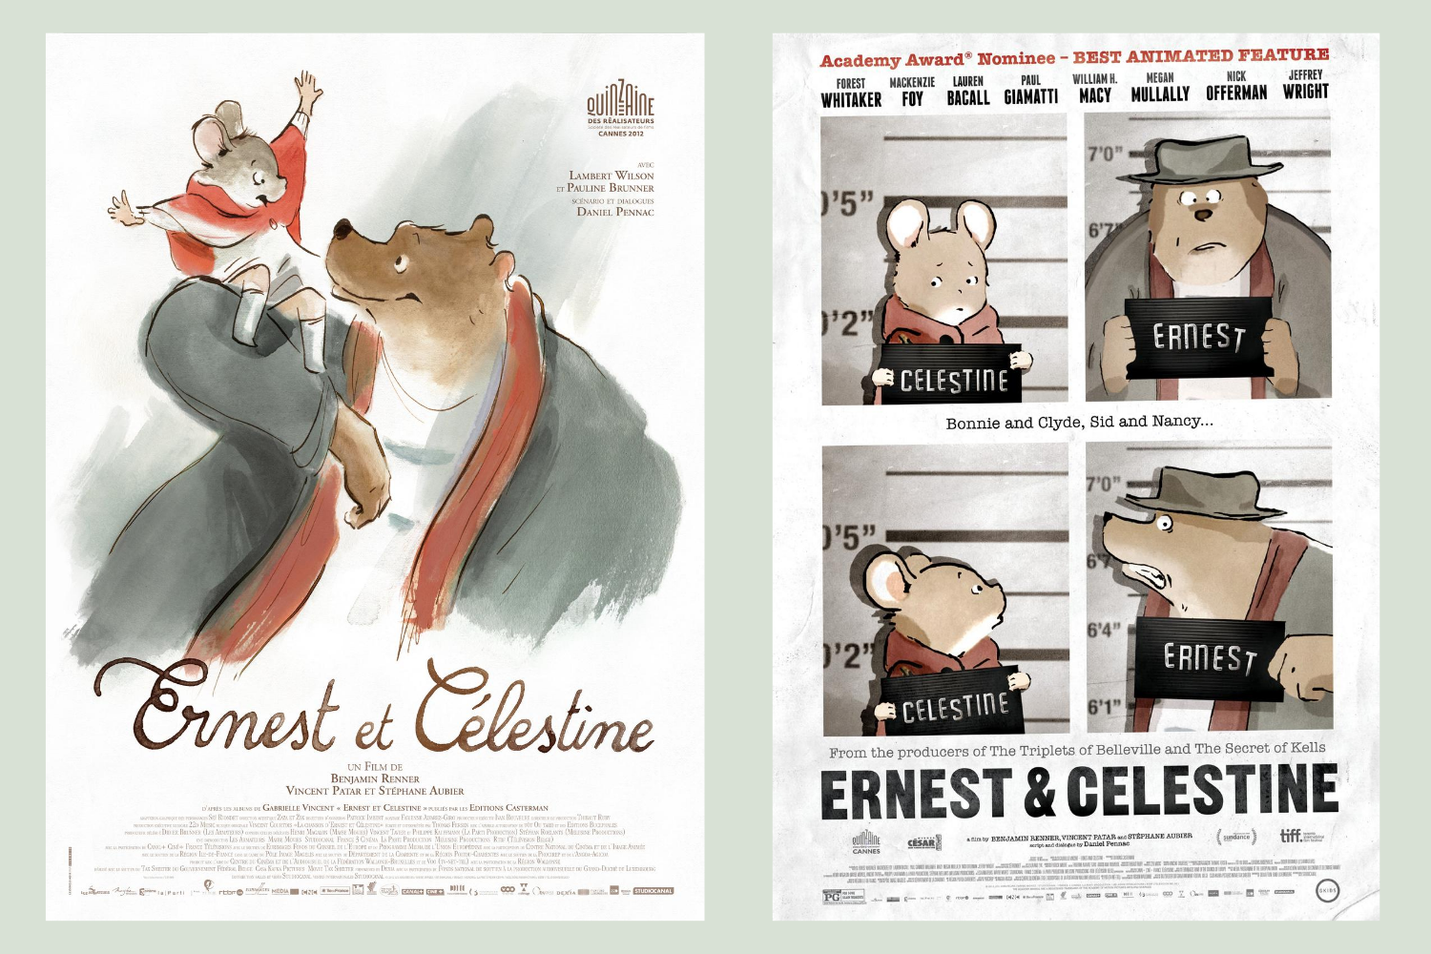 Ernest Celestine posters